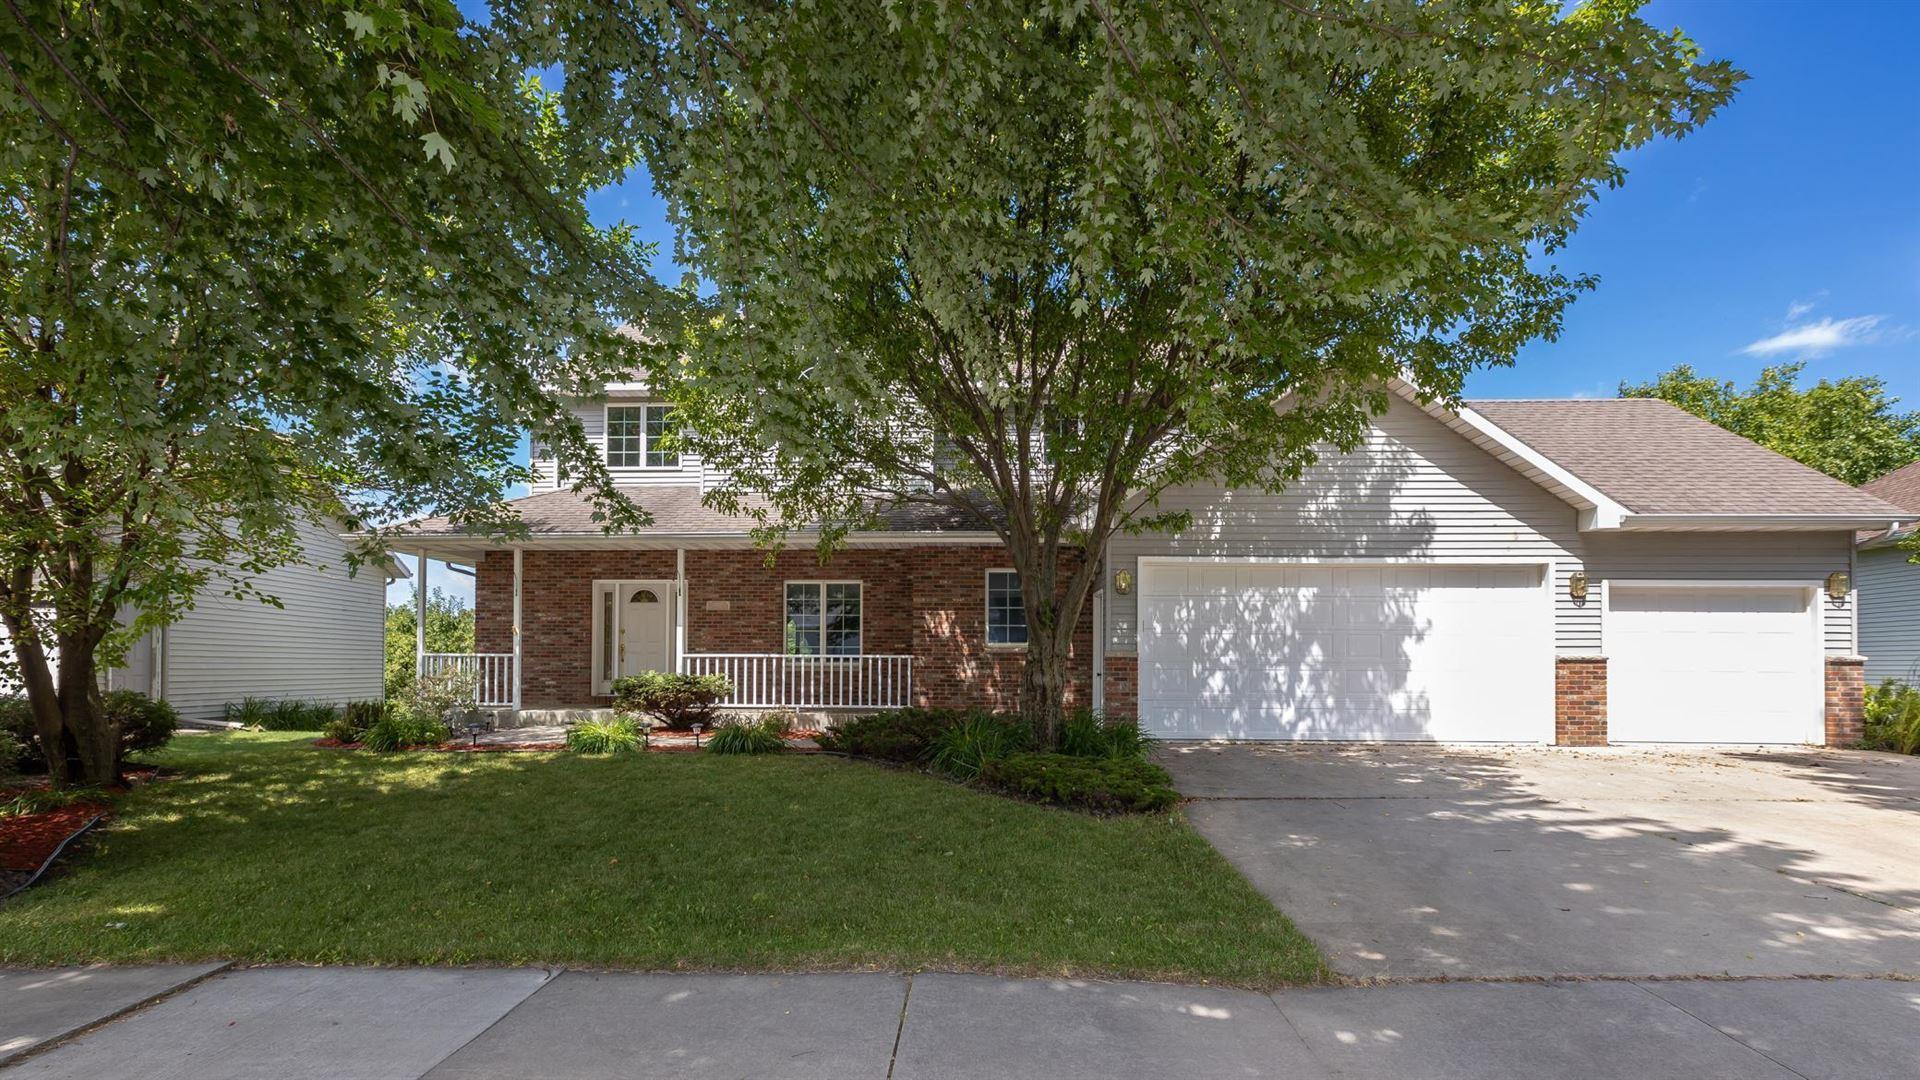 2027 Century Hills Drive NE, Rochester, MN 55906 - MLS#: 5634594